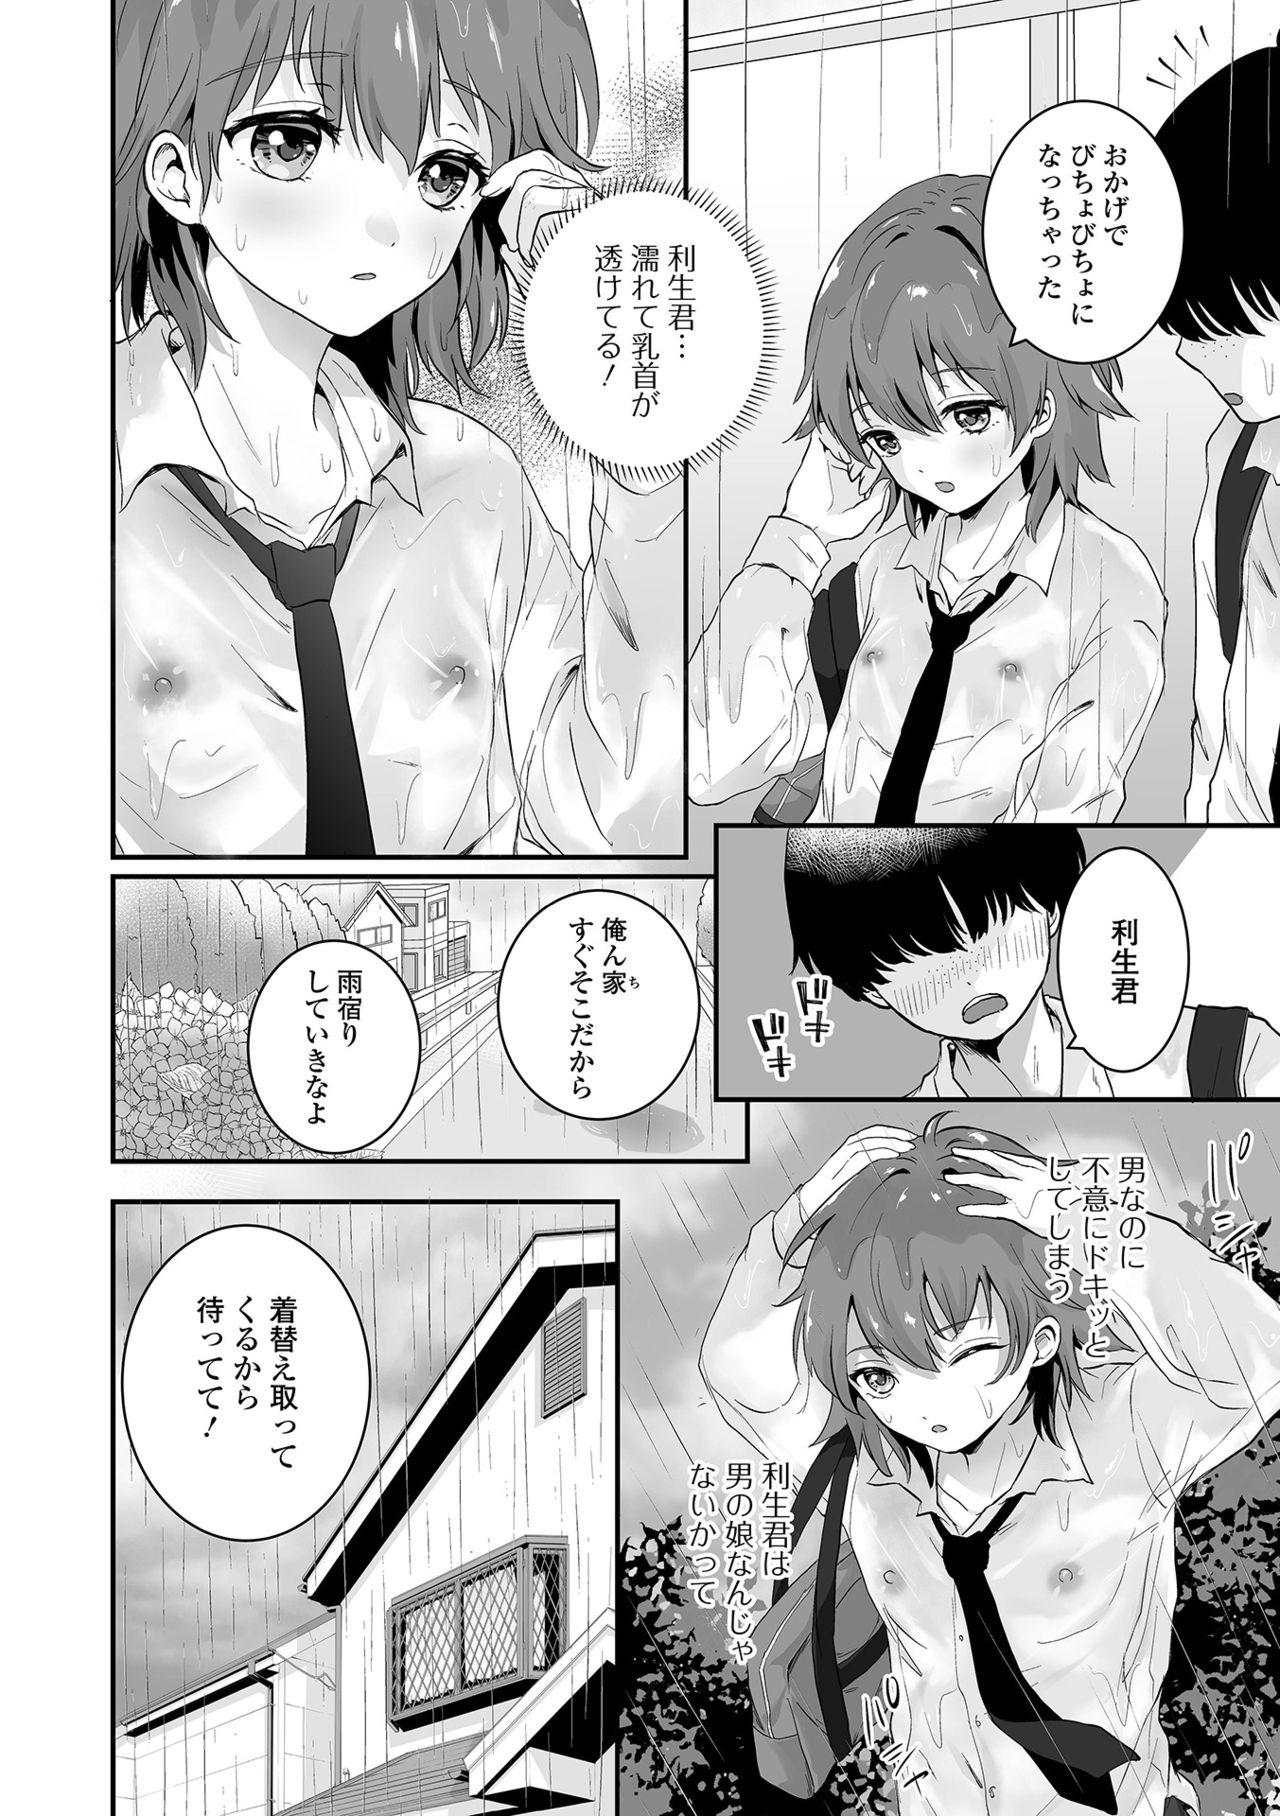 Gekkan Web Otoko no Ko-llection! S Vol. 64 35